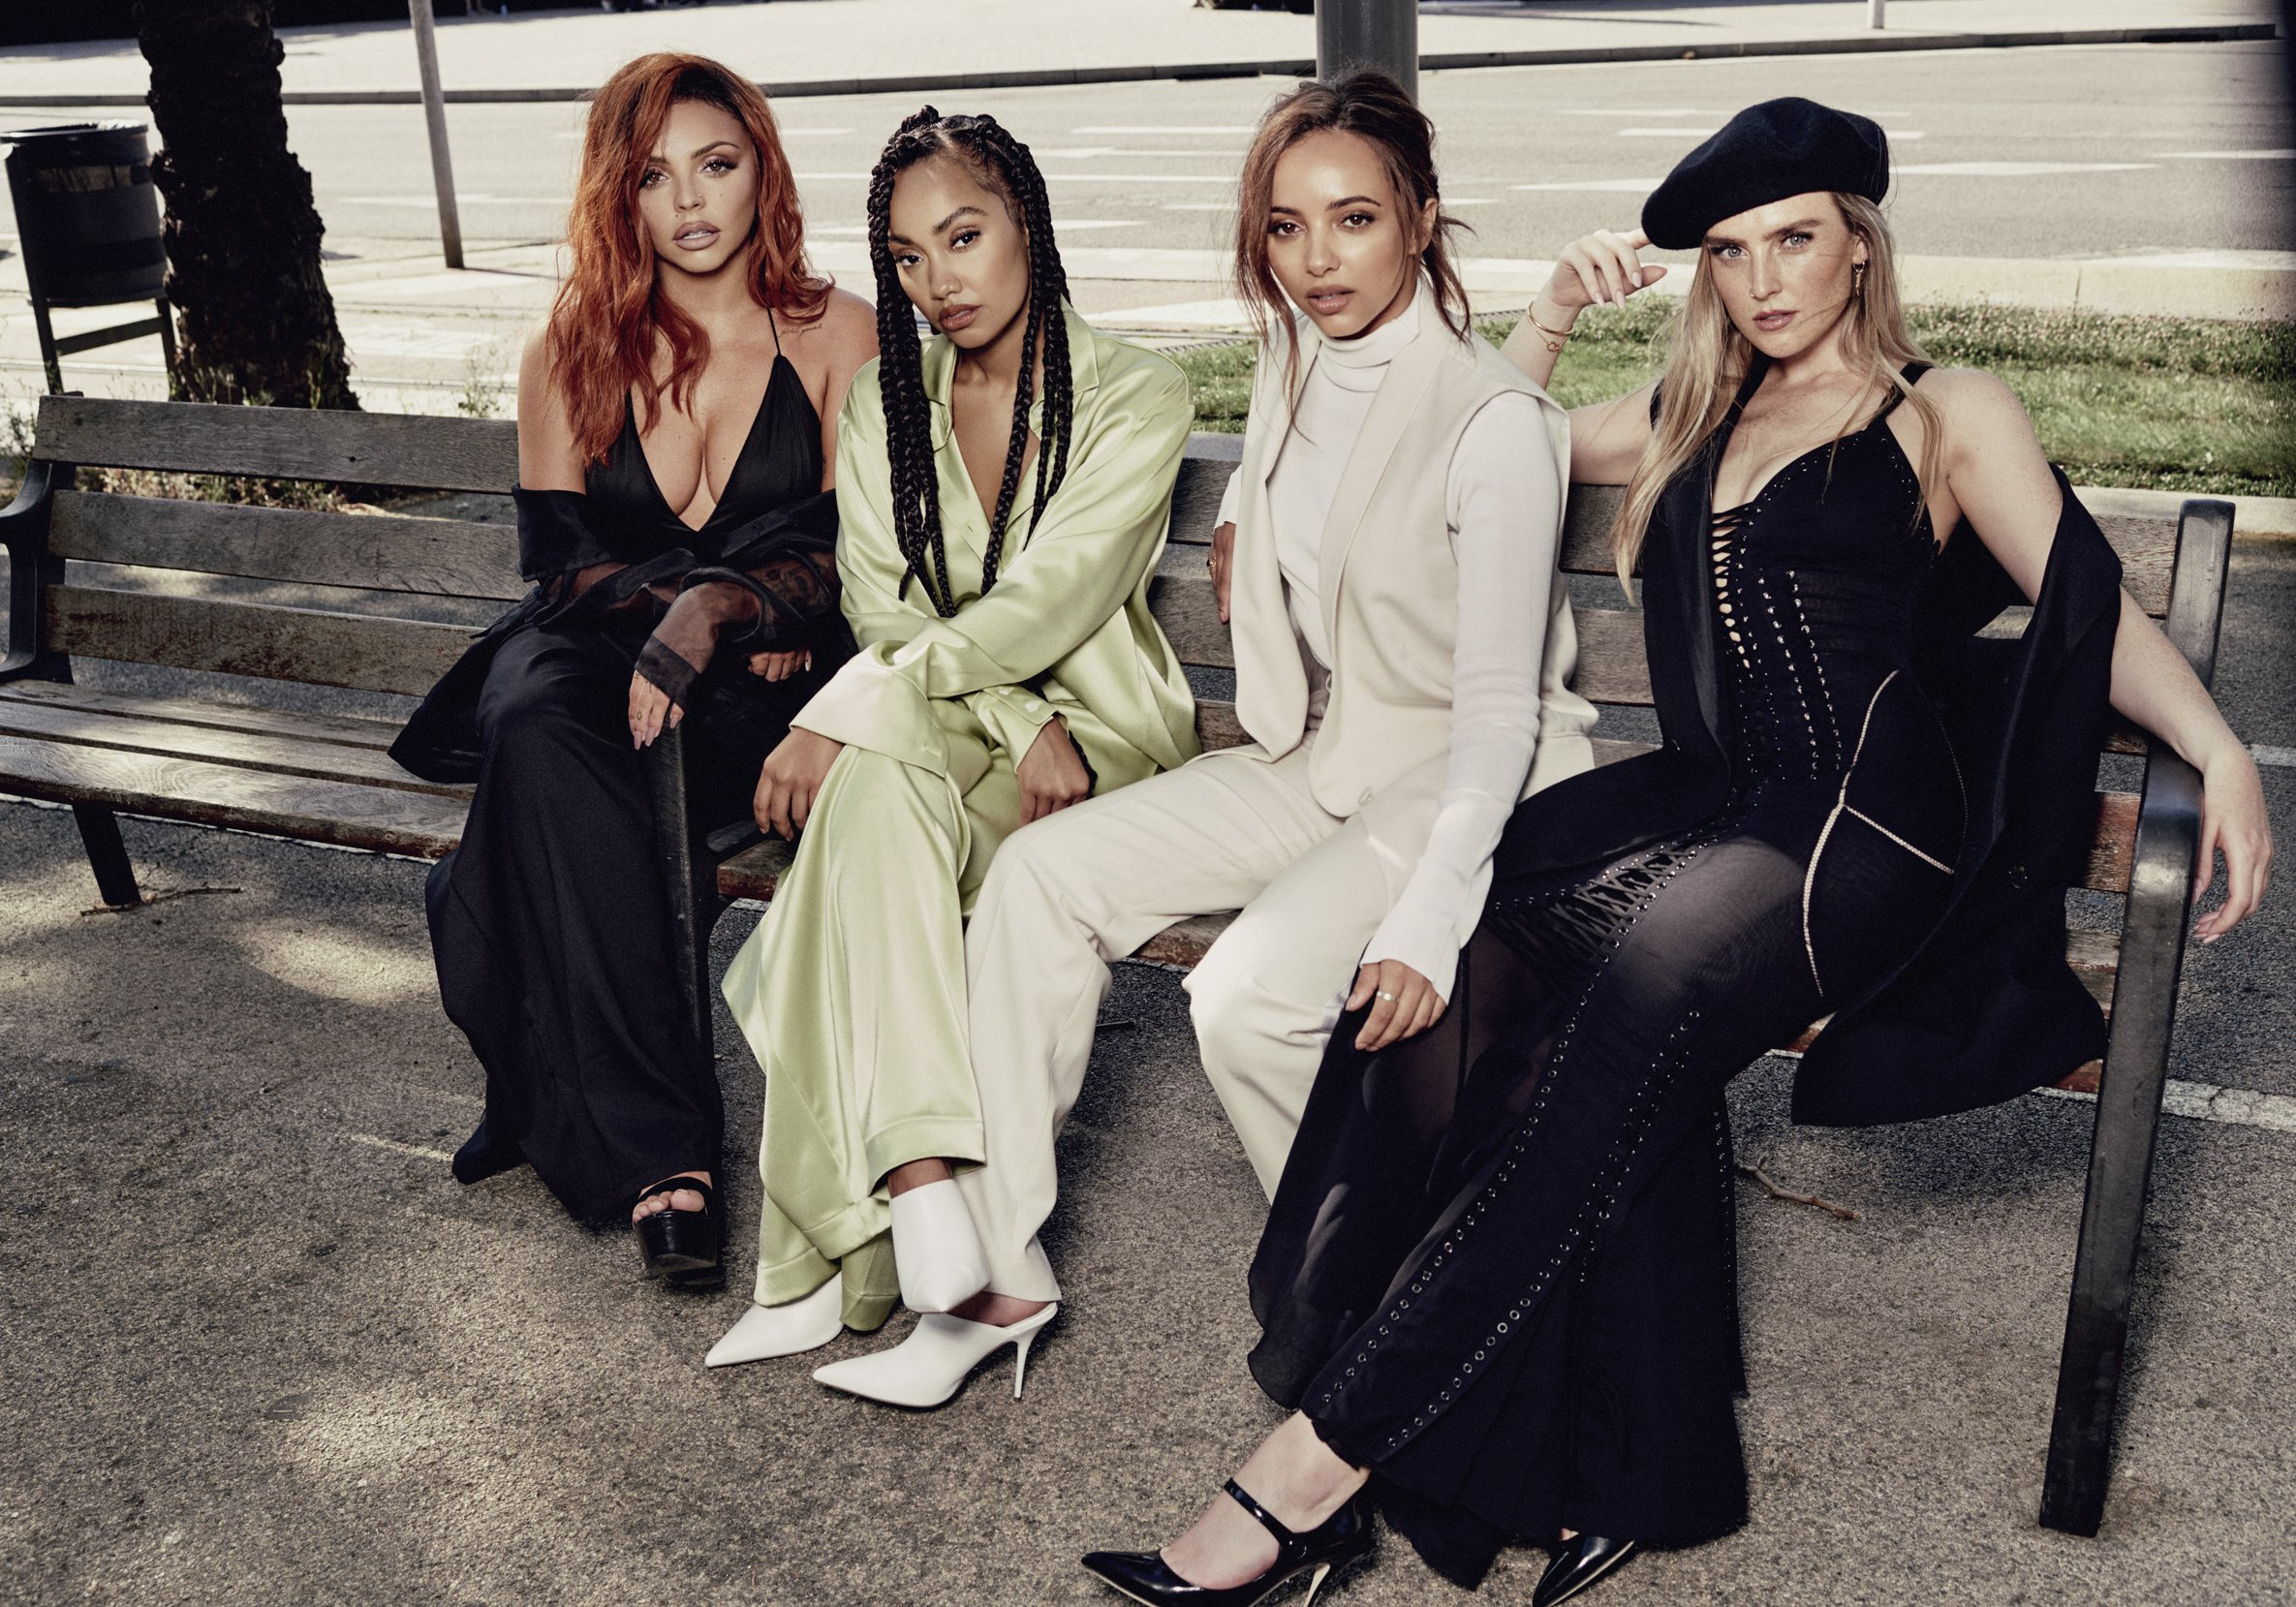 Little Mix supplied by Simon Jones PR